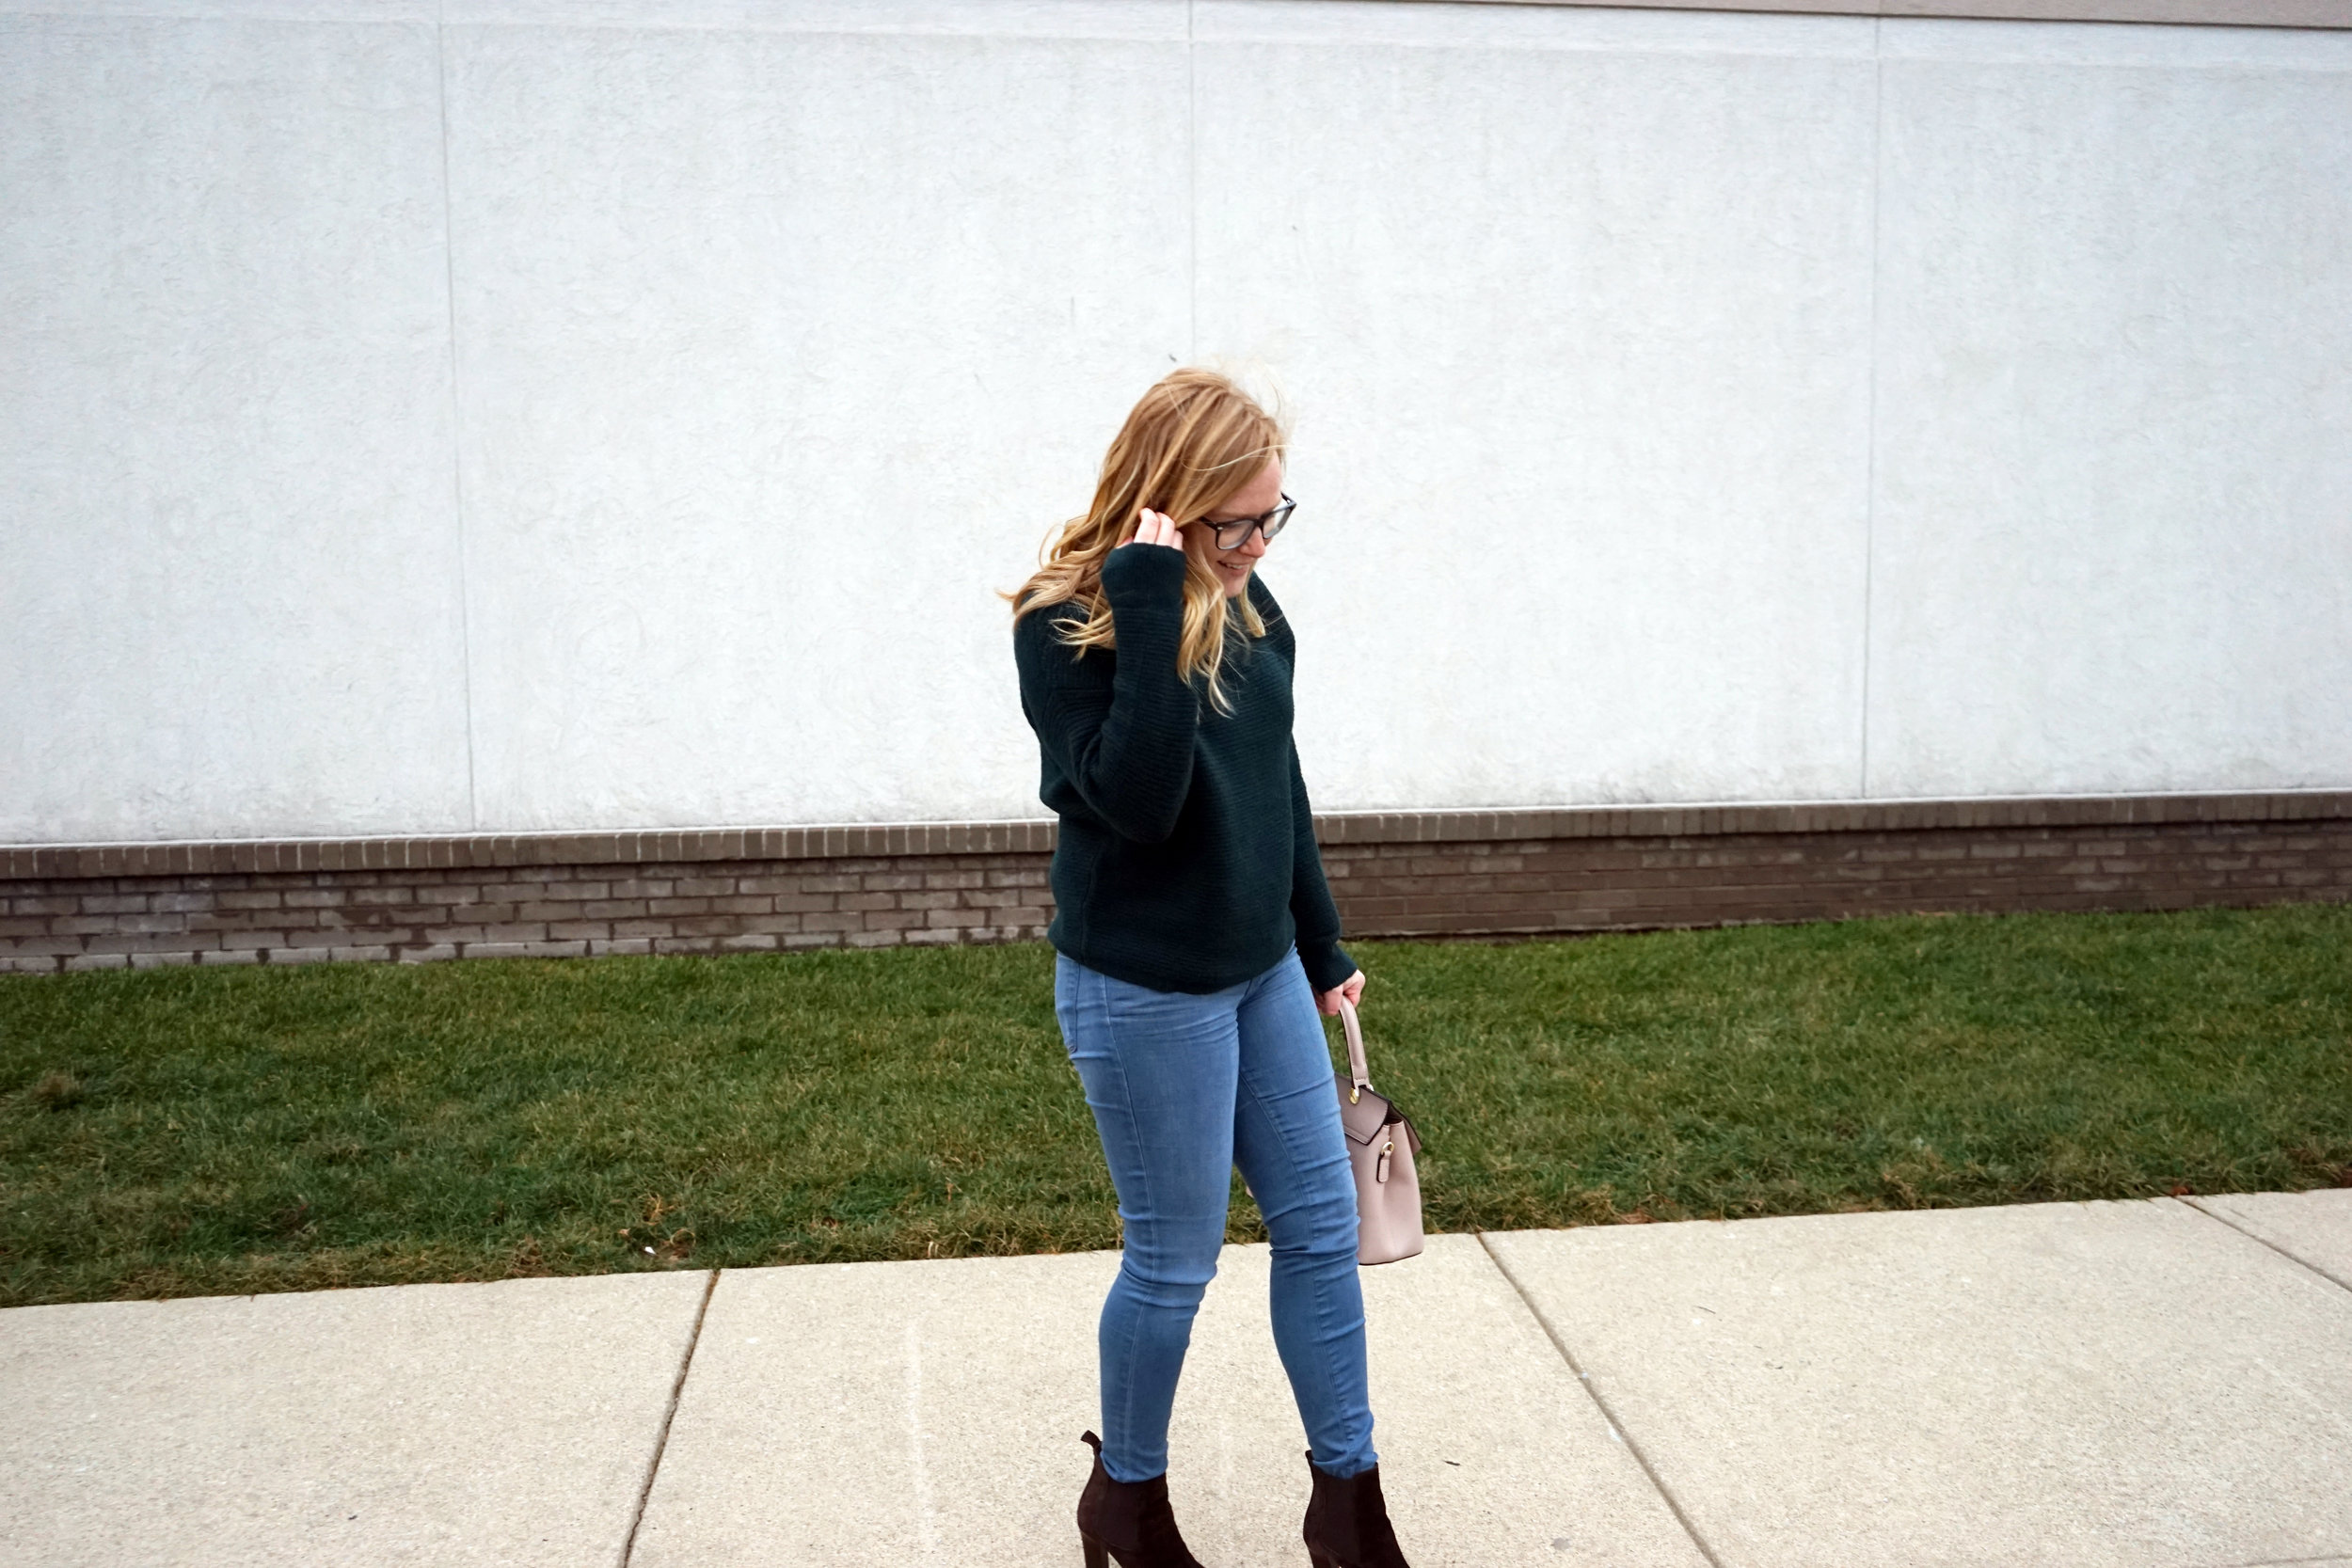 Maggie a la Mode - Madewell Southfield Mockneck sweater, J Brand 620 Super Skinny Jeans Impulse, M Gemi The Avanti Boot, Camelia Roma Leather Handbag Cameo